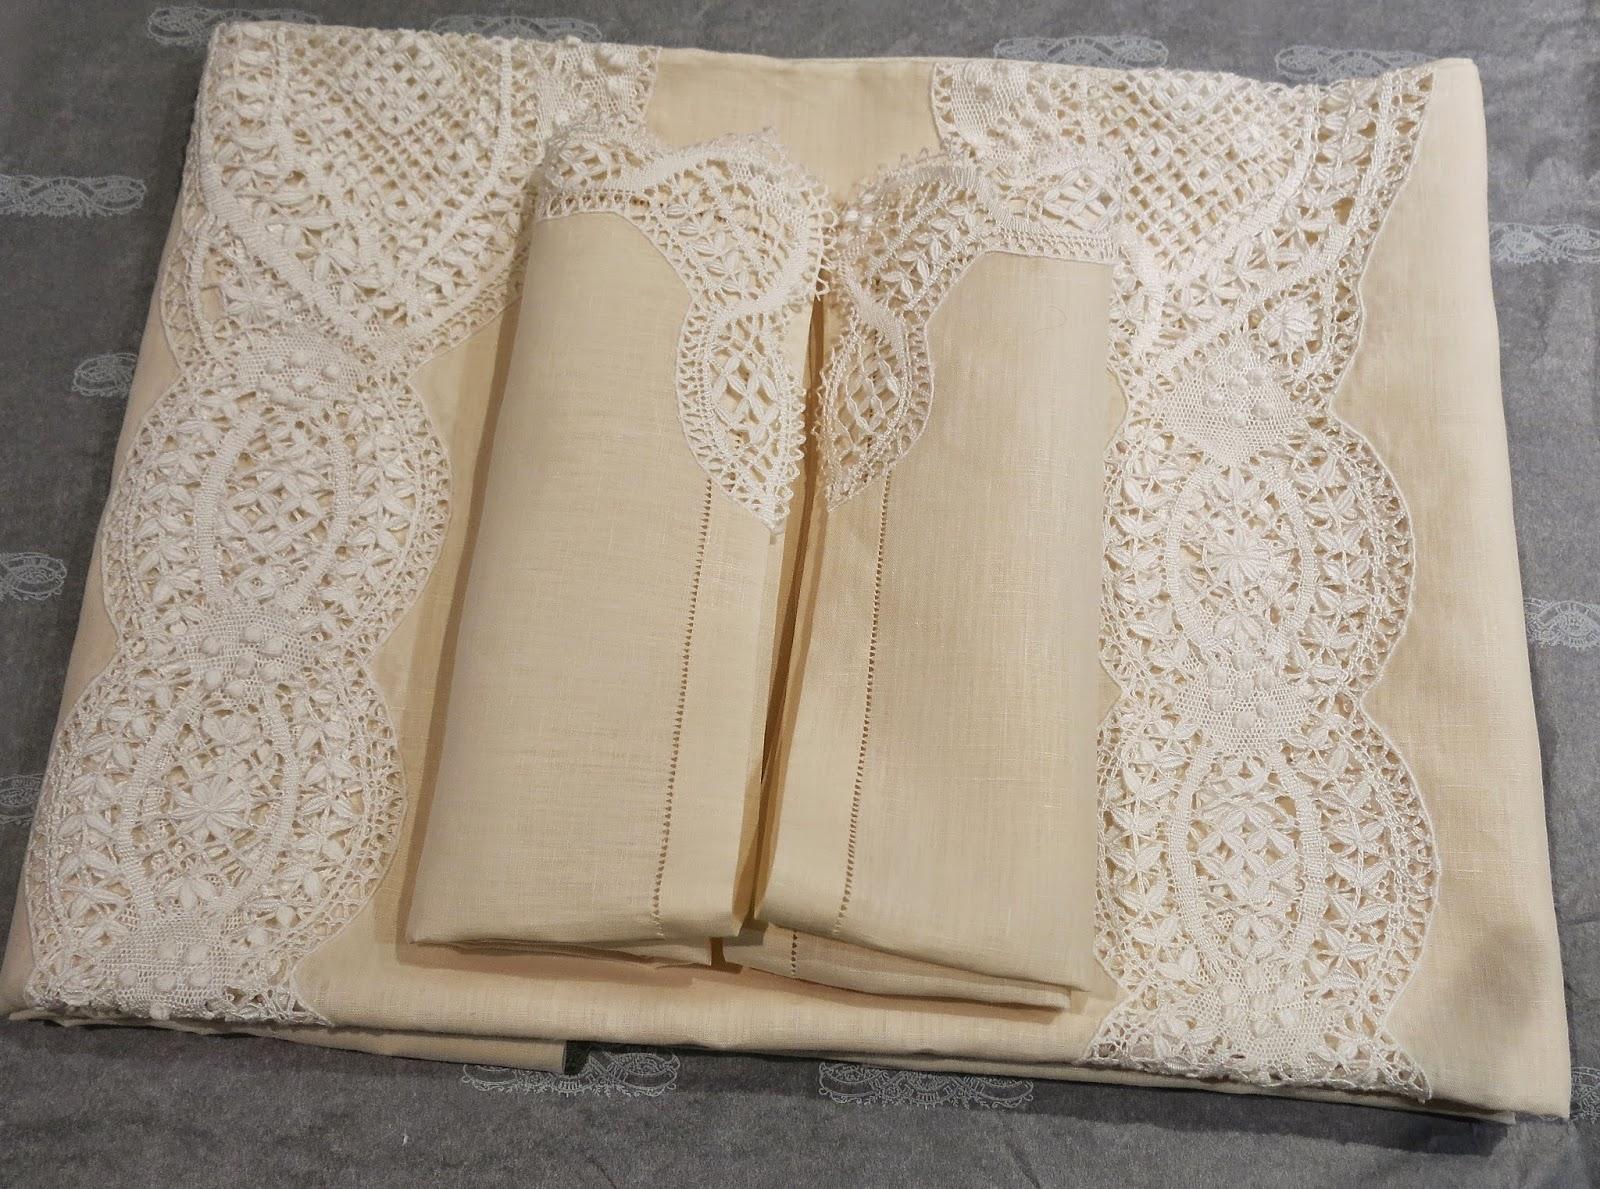 Manteleria de lino encaje y vainicas dosel lencer a de - Manteles de lino ...